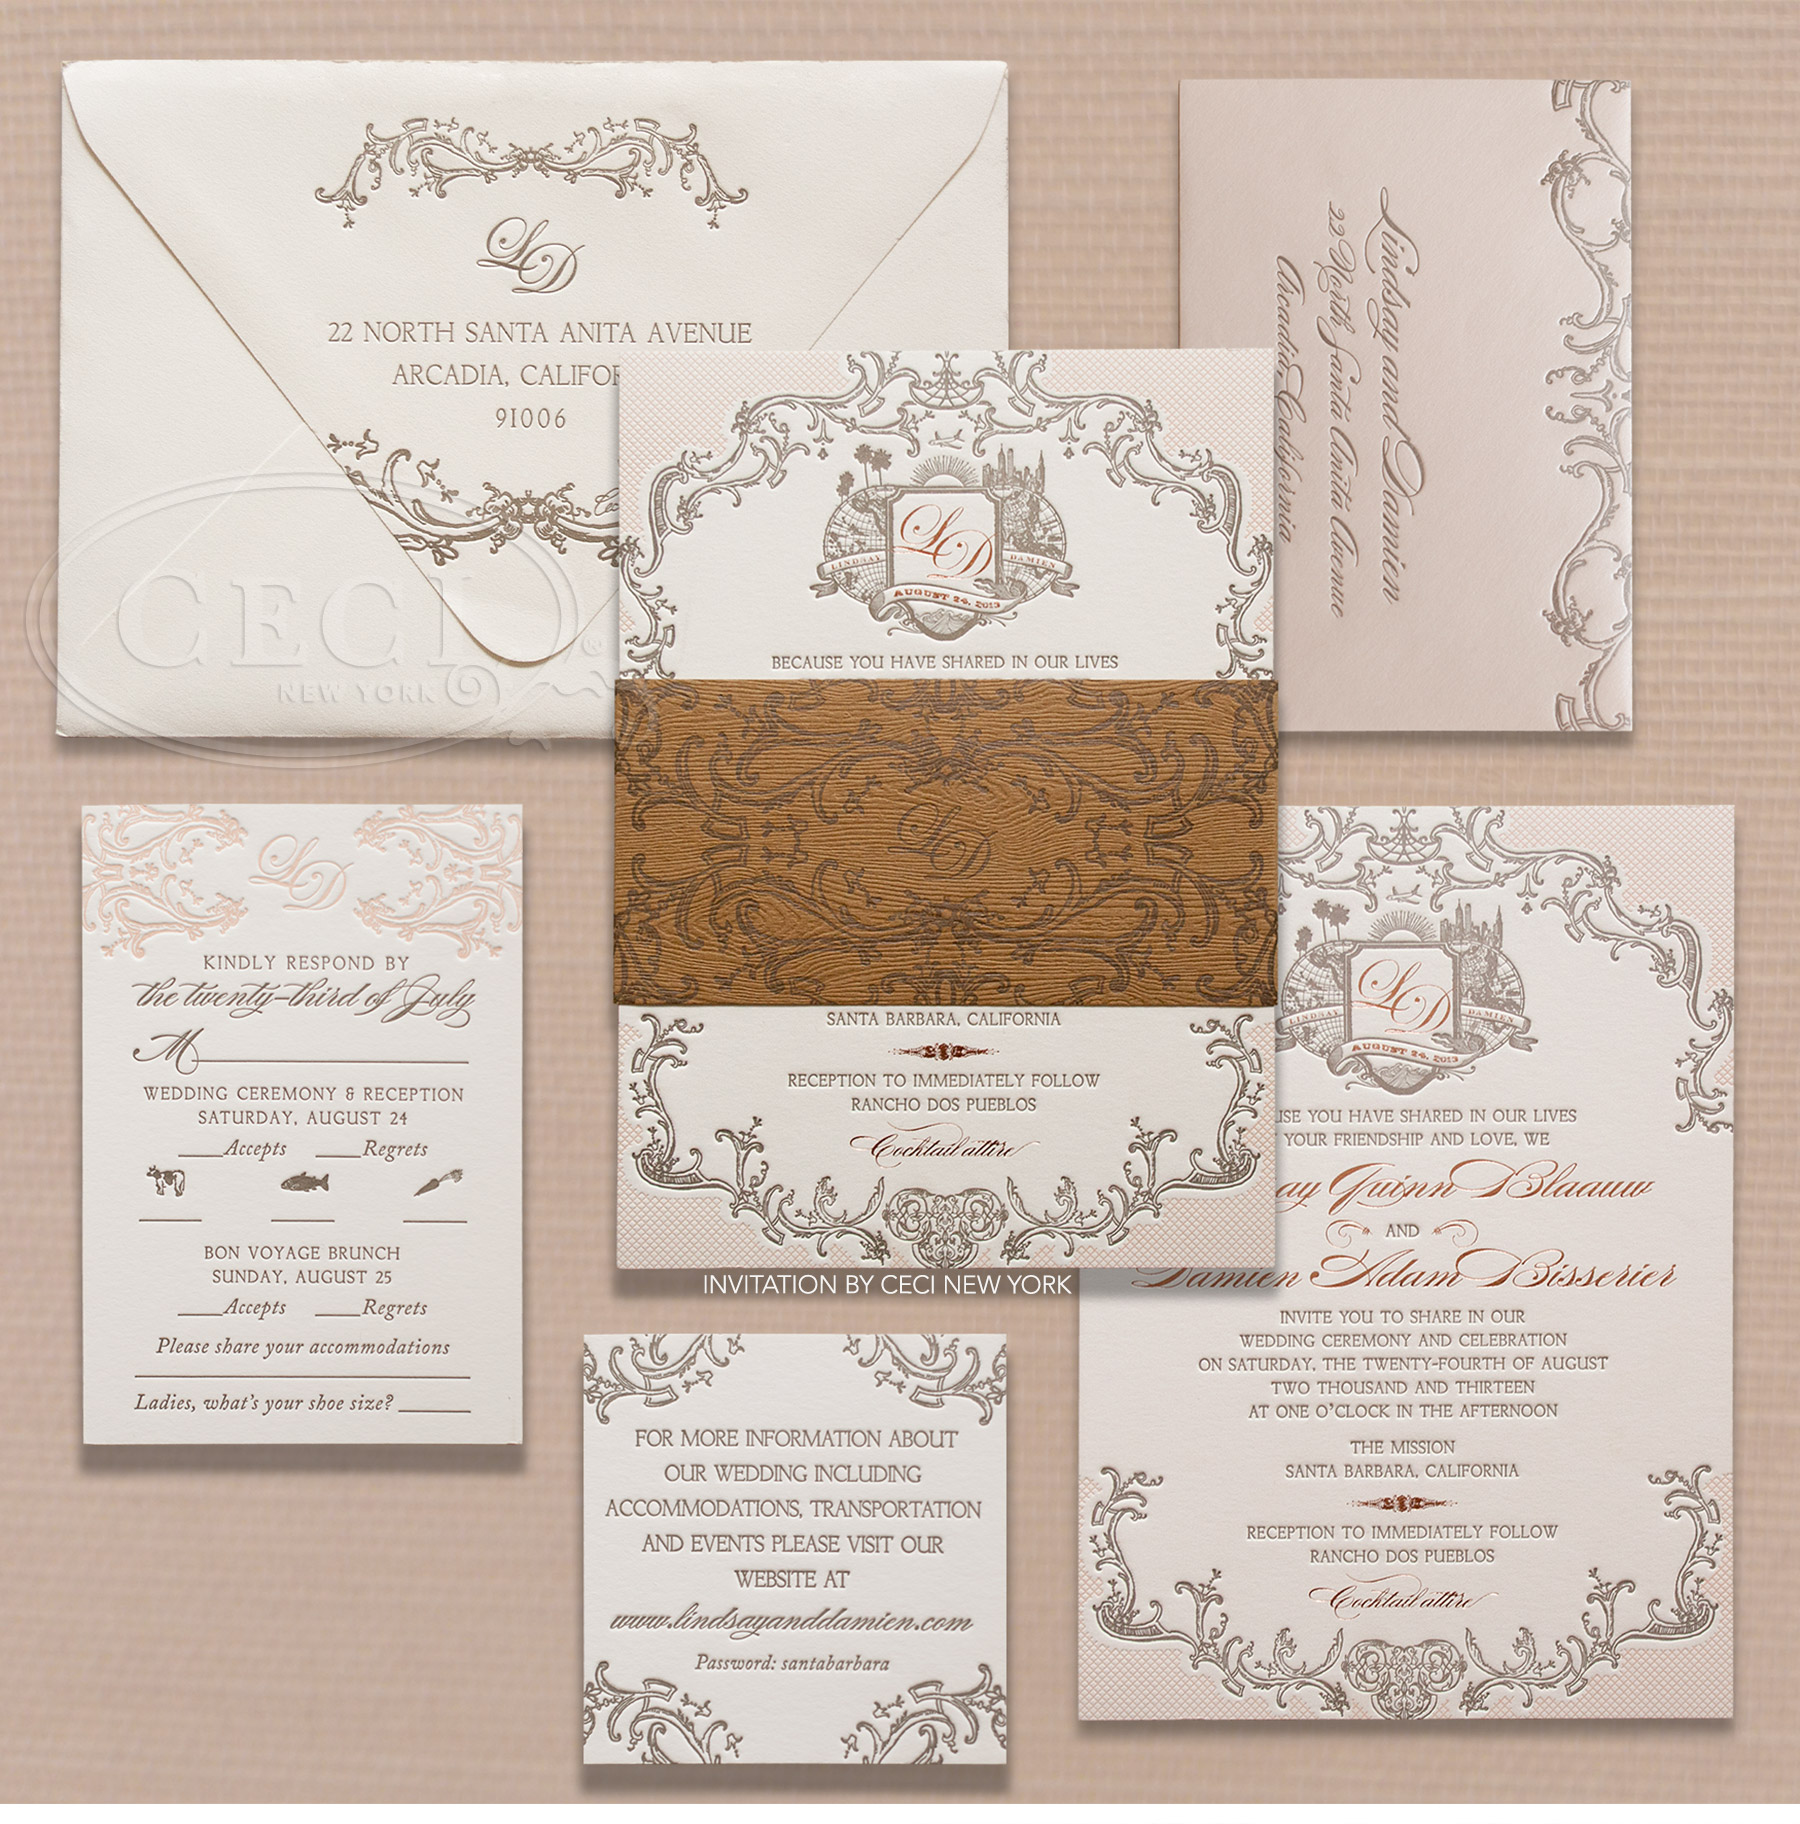 luxury_wedding_rancho_dos_pueblos_santa_barbara_california_ranch_rustic_travel_pink_blush_invitations_v245_om_1a.jpg